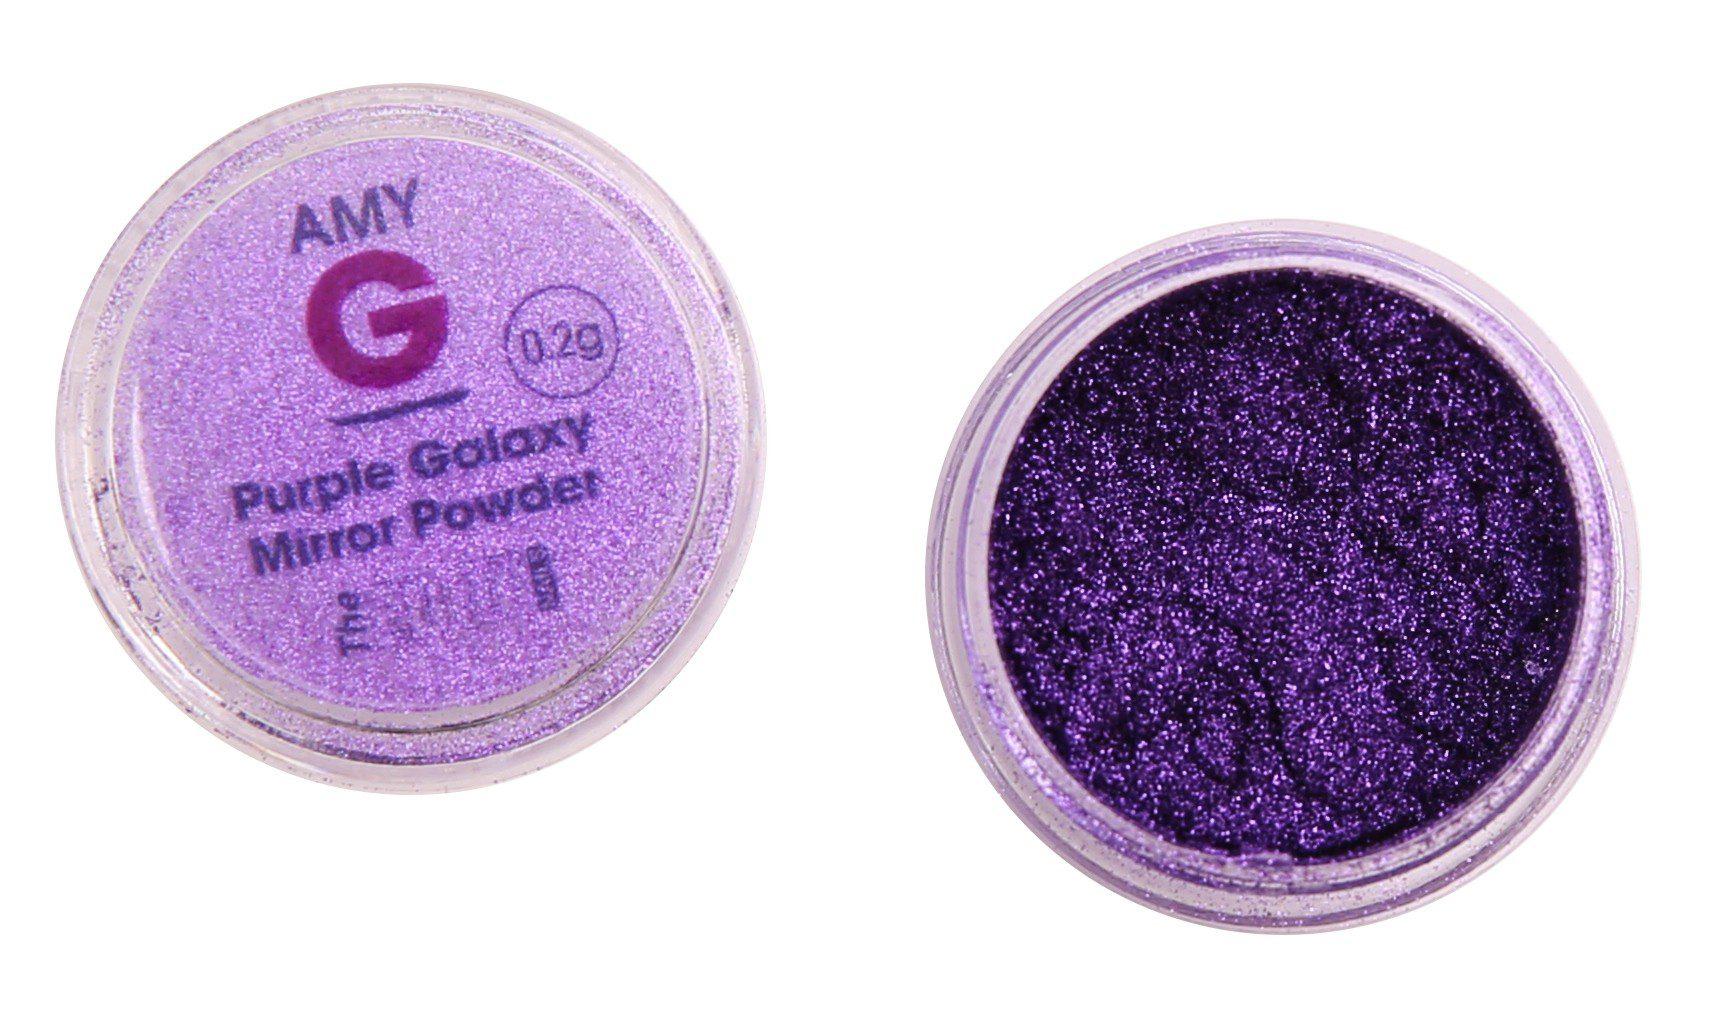 30_03_095_-_purple_galaxy_mirror_powder_lid_off